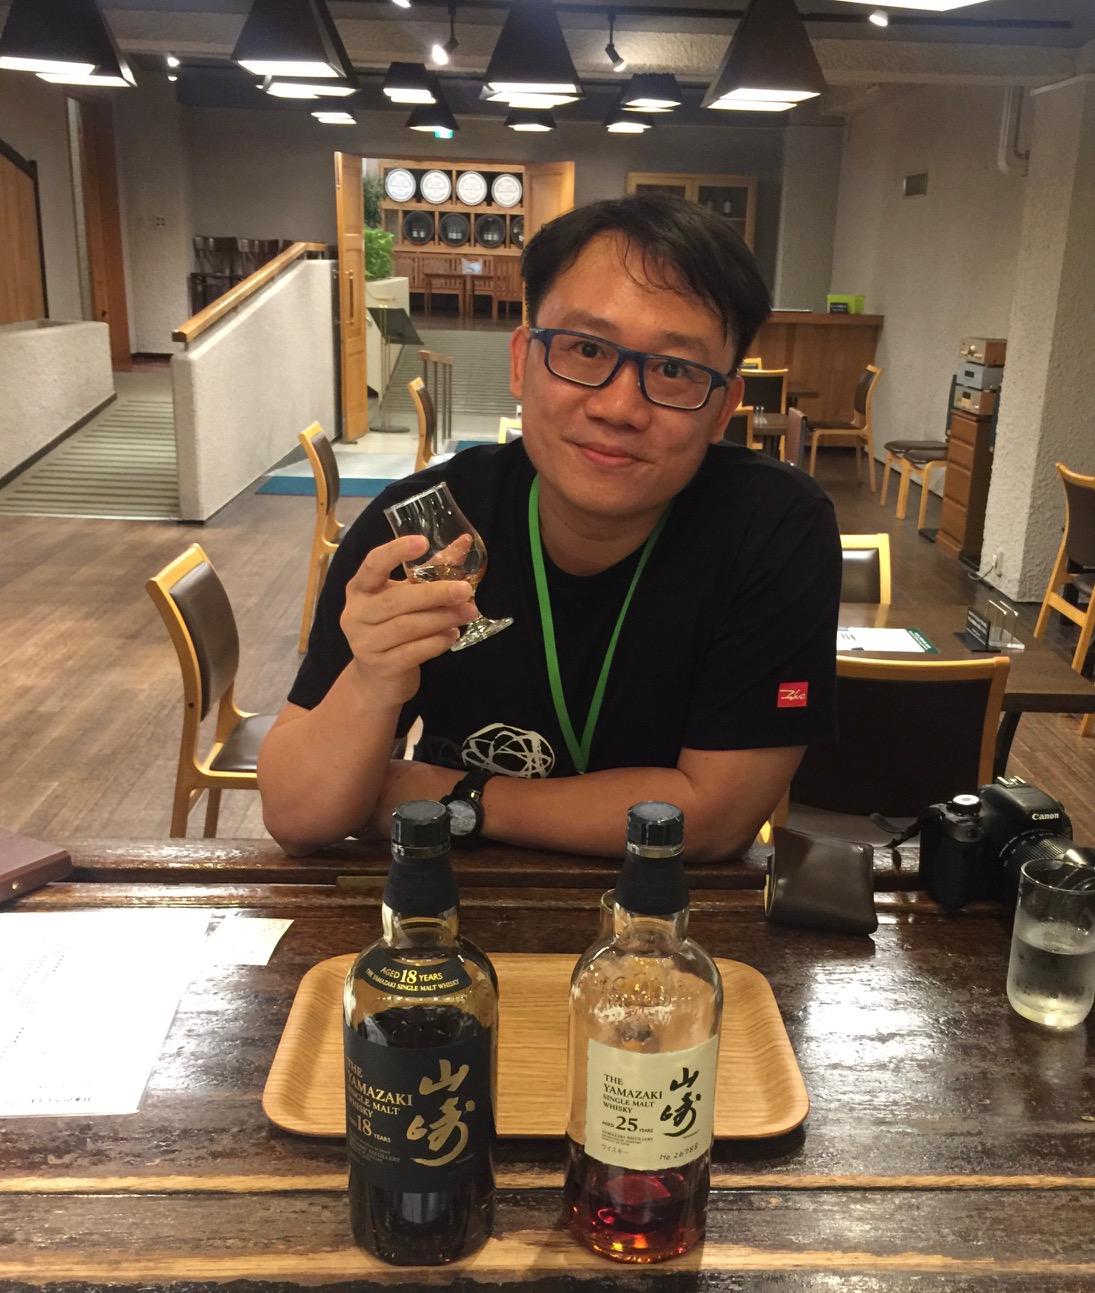 Photo of Yamazaki 25 Year Old by Kok in New York